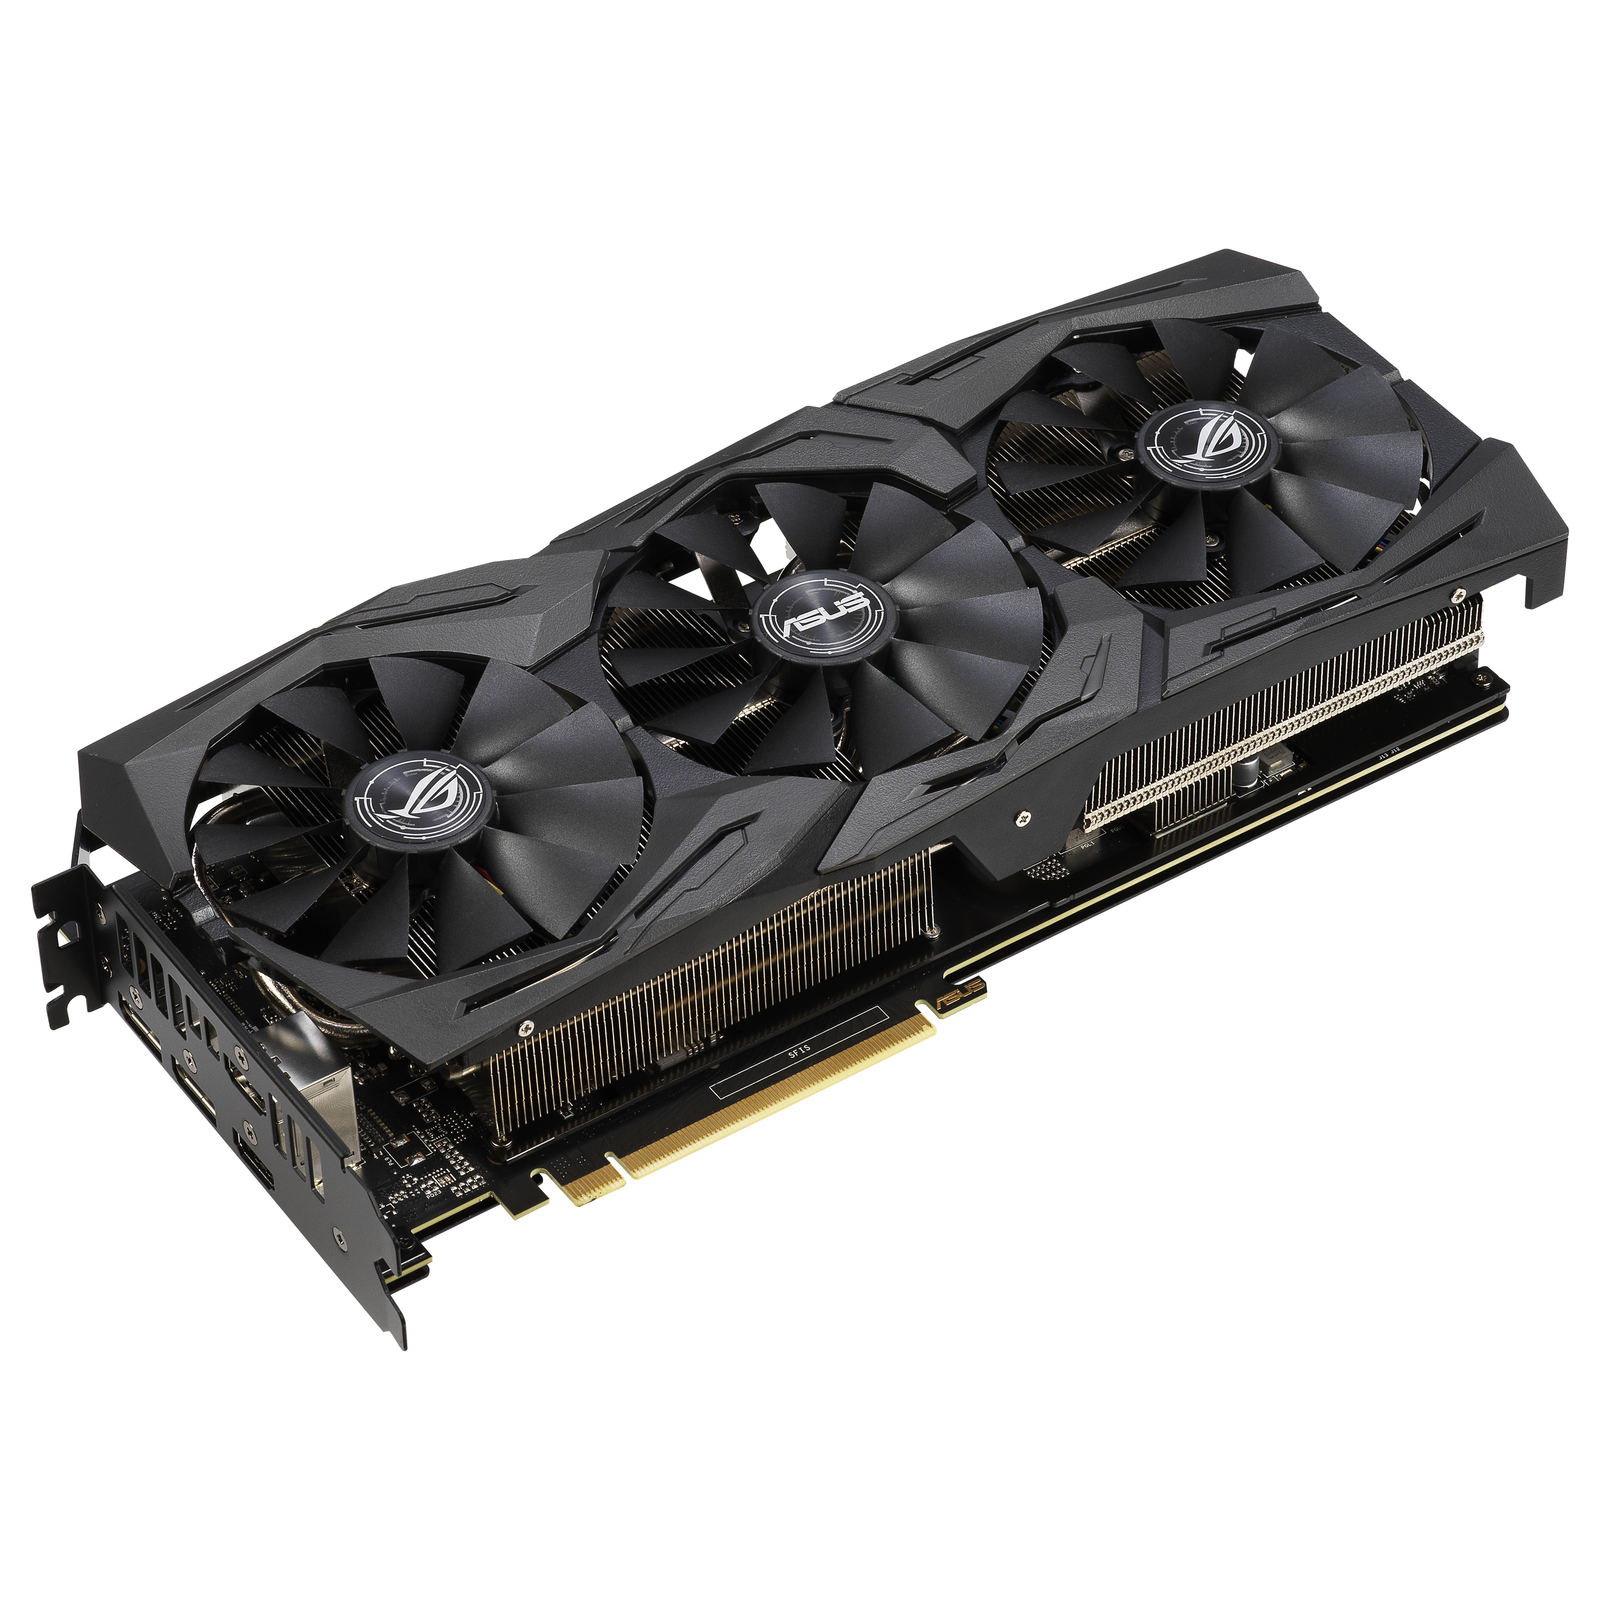 ASUS GeForce Strix RTX 2060 OC Edition 6GB Graphics Card image